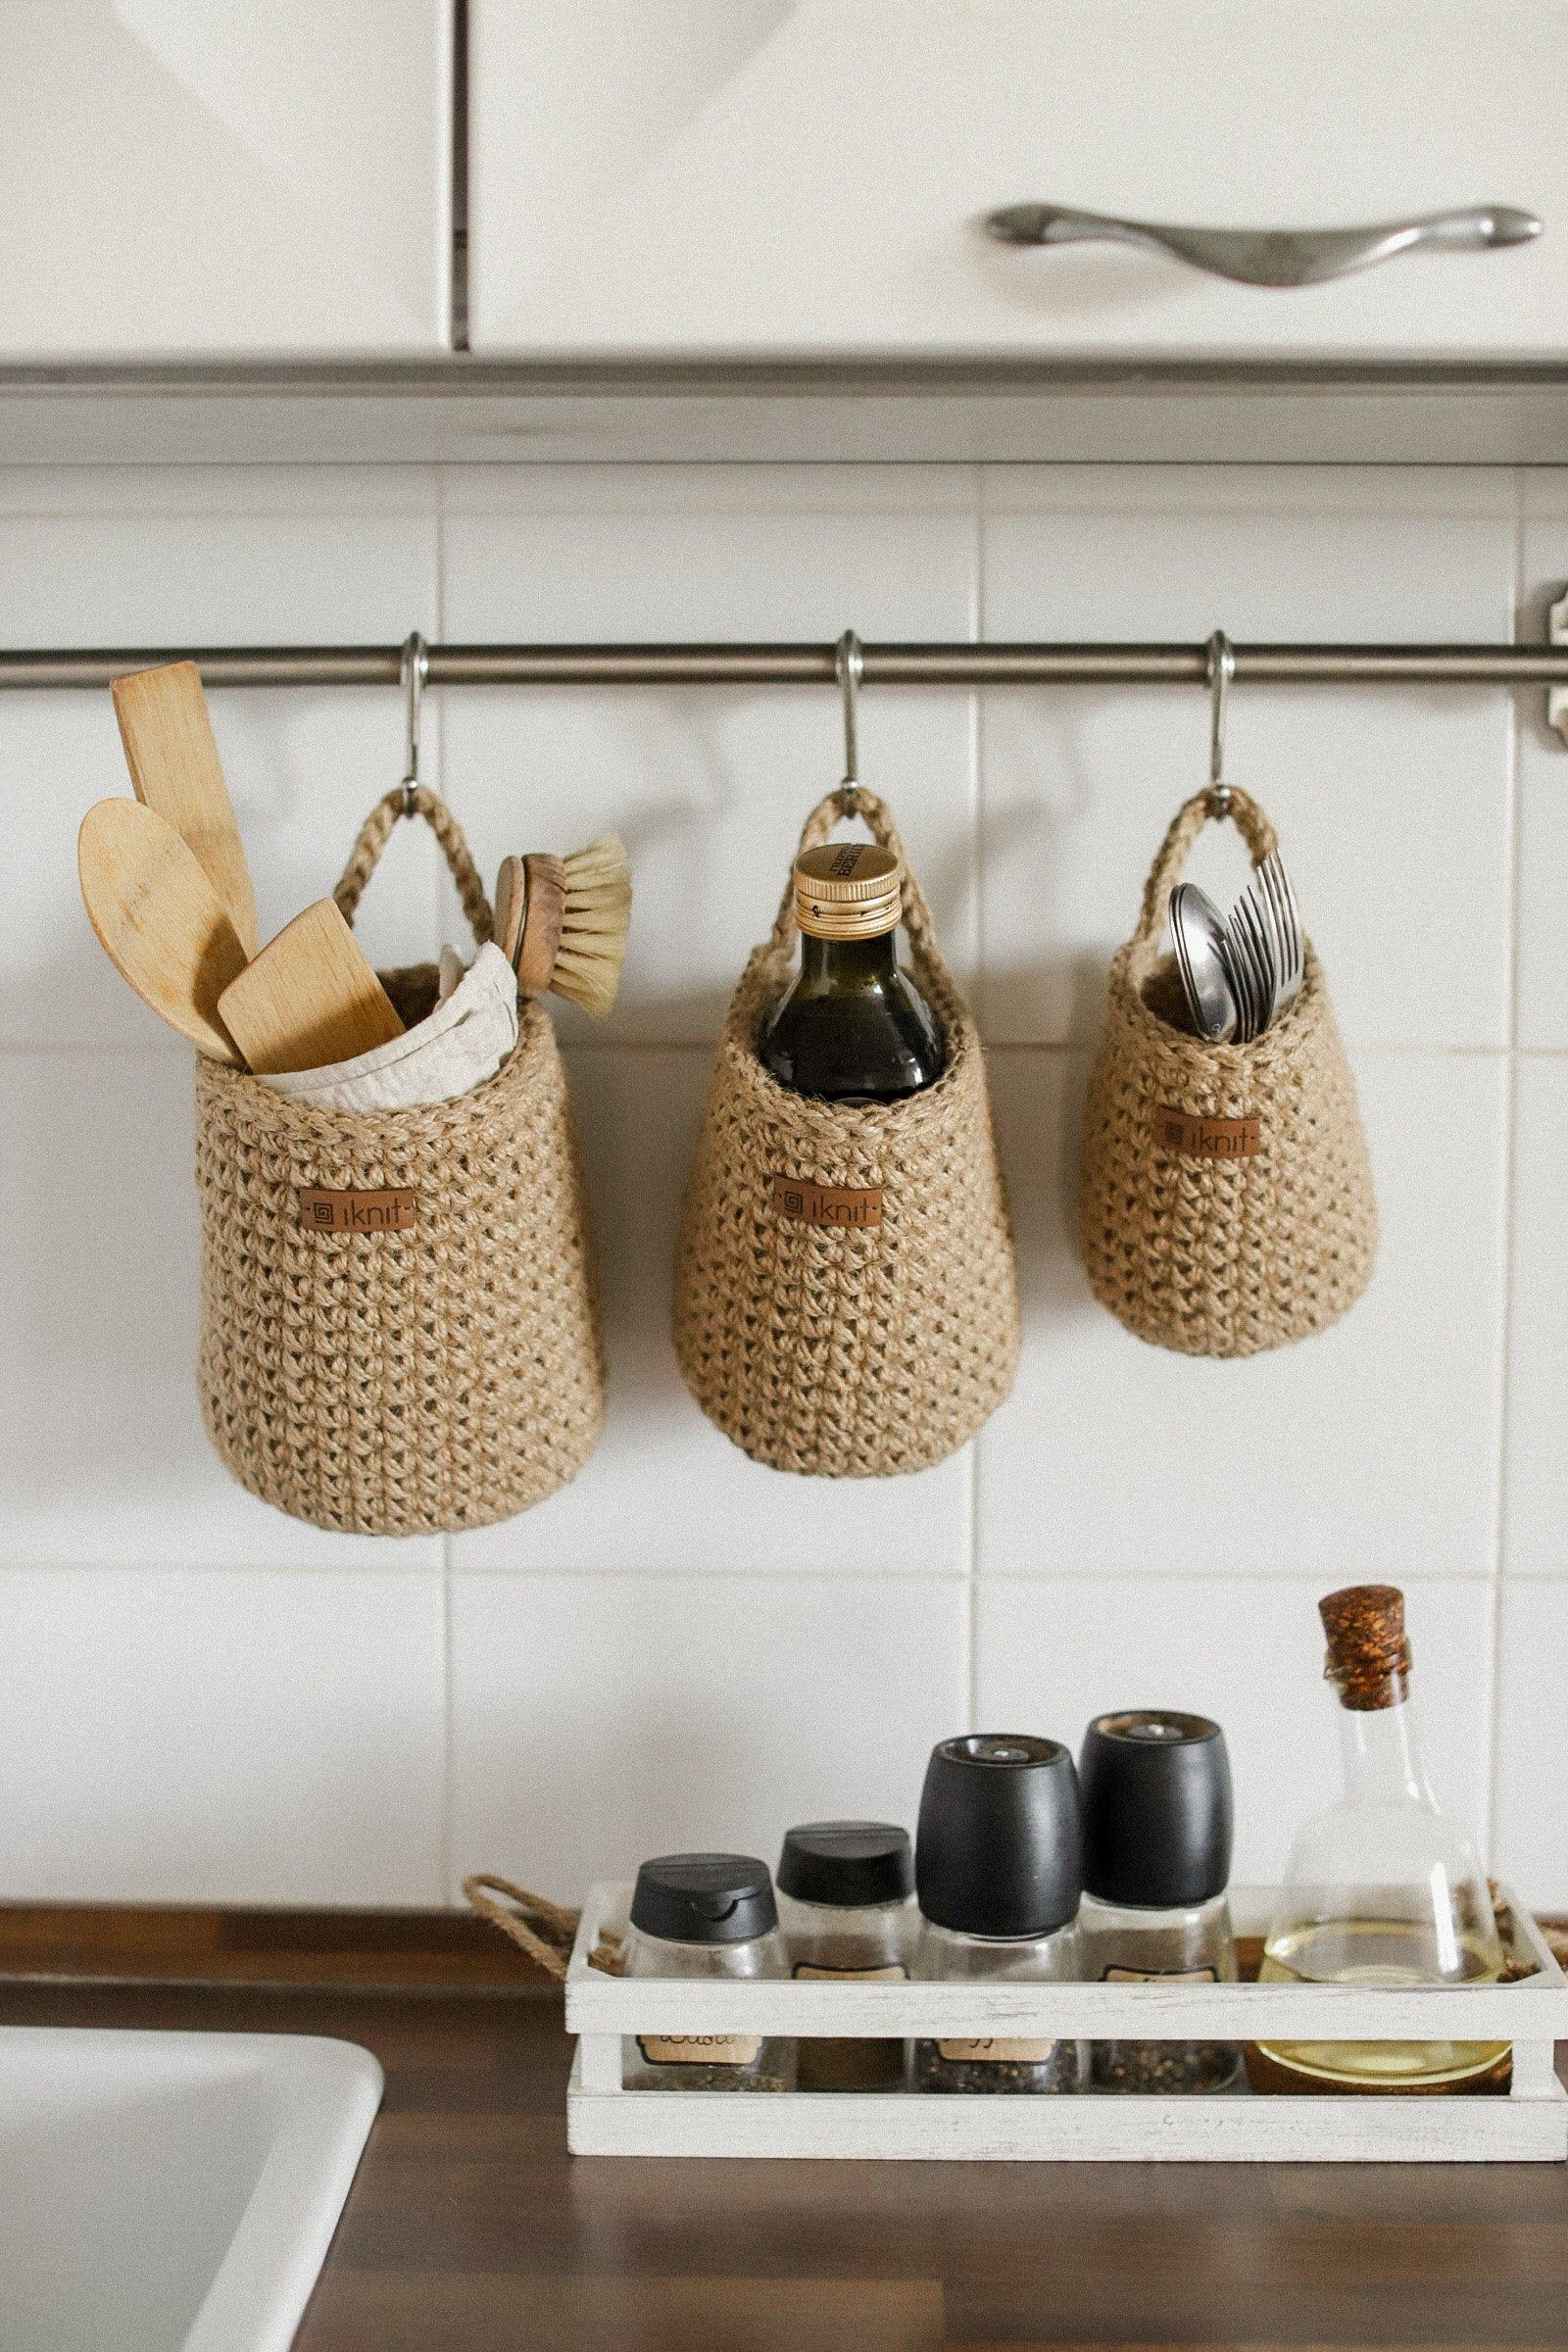 Photo of Crochet jute baskets. Set 3 Storage baskets. Wall hanging storage baskets. Jute Hanging baskets